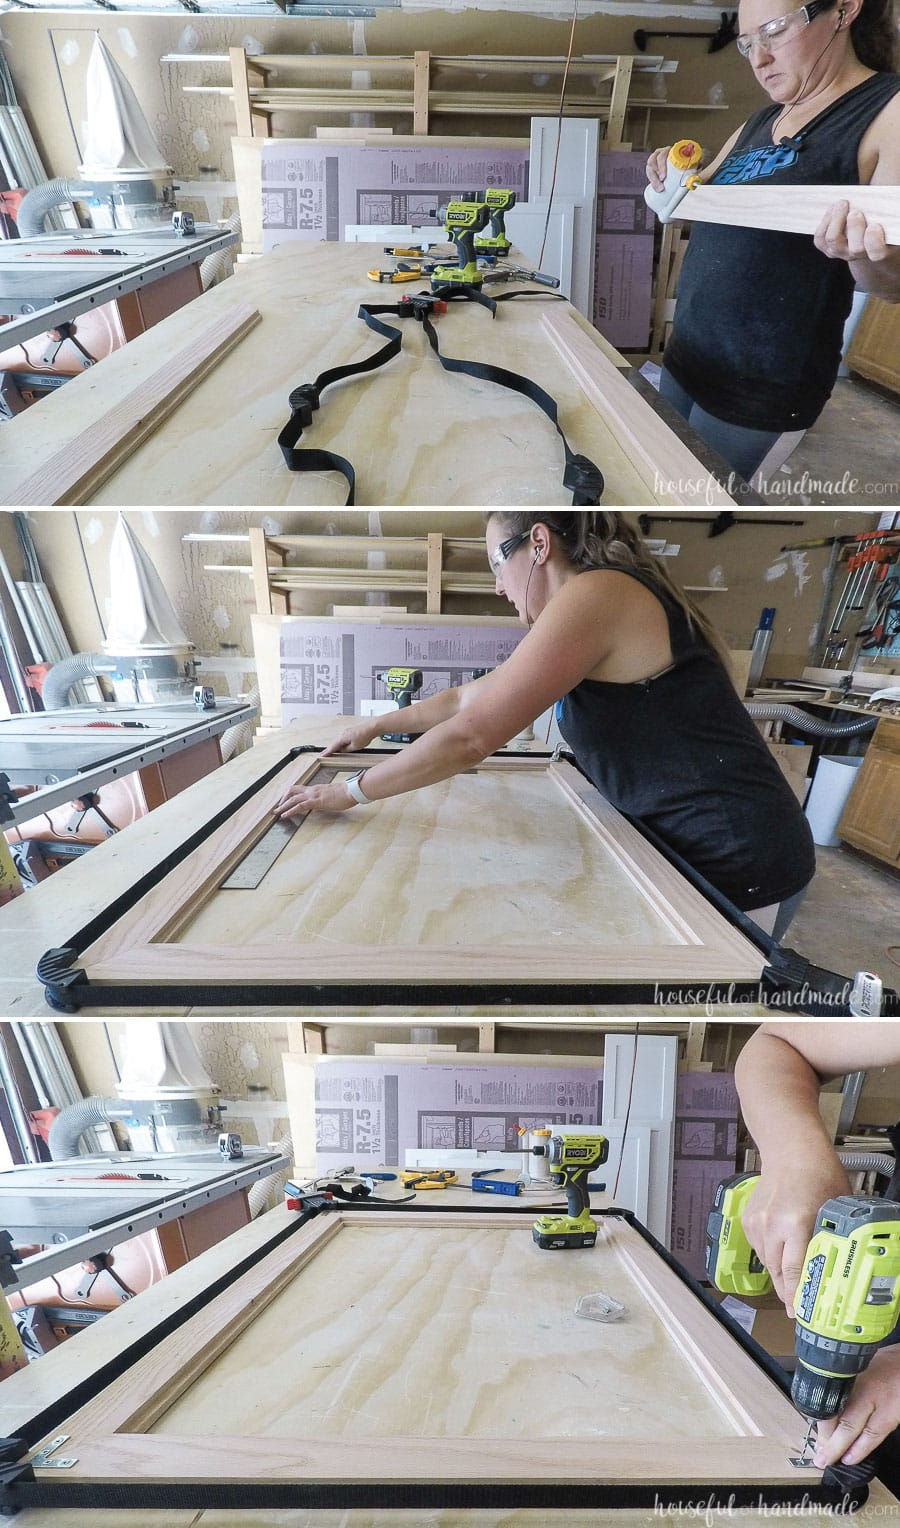 Assembling the oak frame to go around the DIY bathroom mirror.